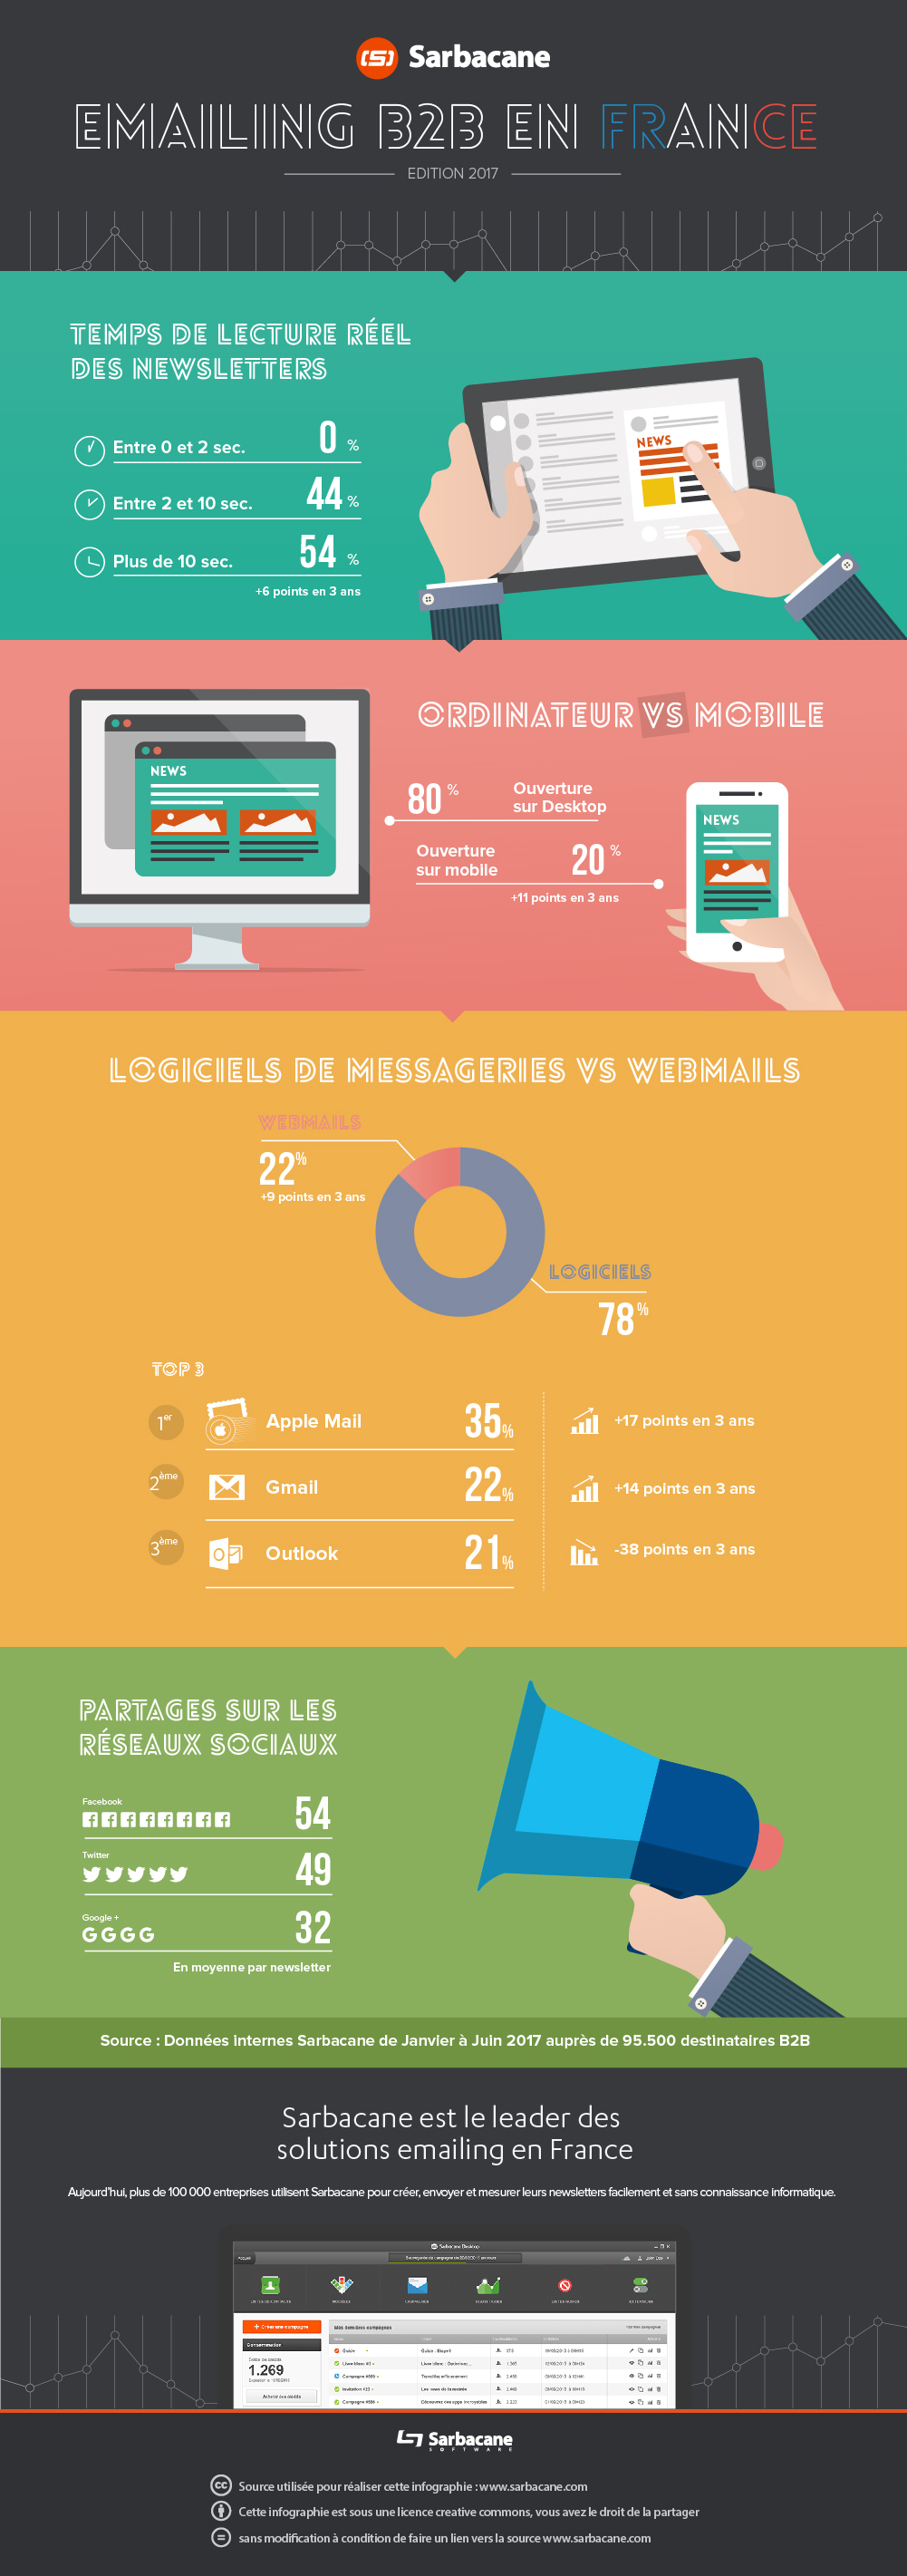 [Infographie] Emailing B2B en France – Edition 2017